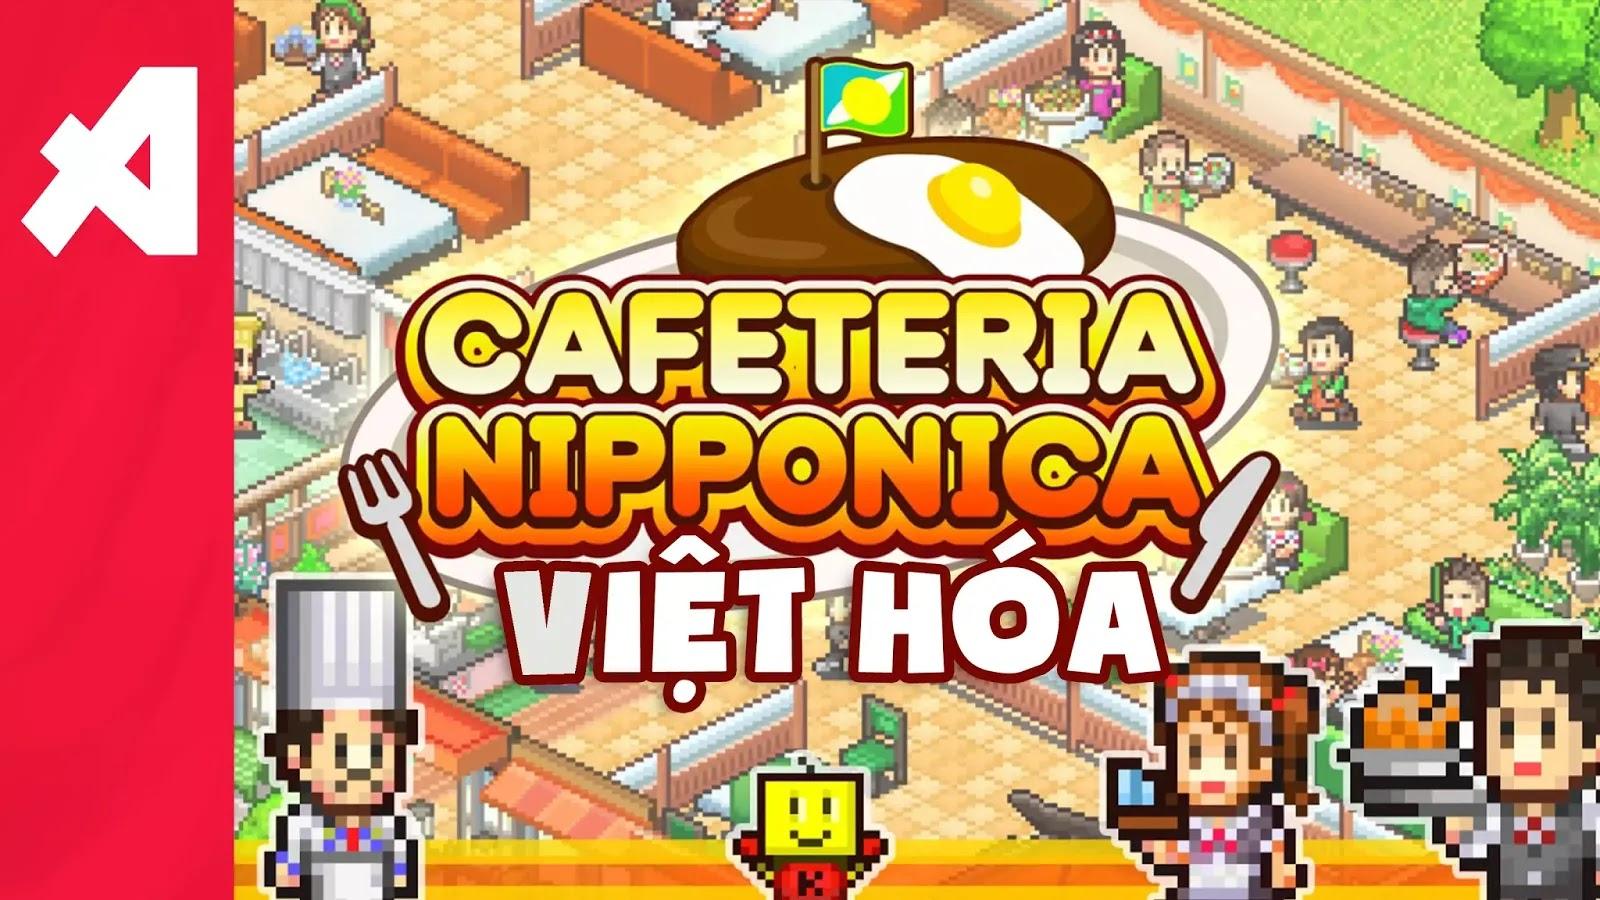 game cafe nippon android viet hoa aowvn%2B%25282%2529 - [ HOT ] Game Cafeteria Nipponica Việt Hoá | Android - Quản Lý Quán Ăn